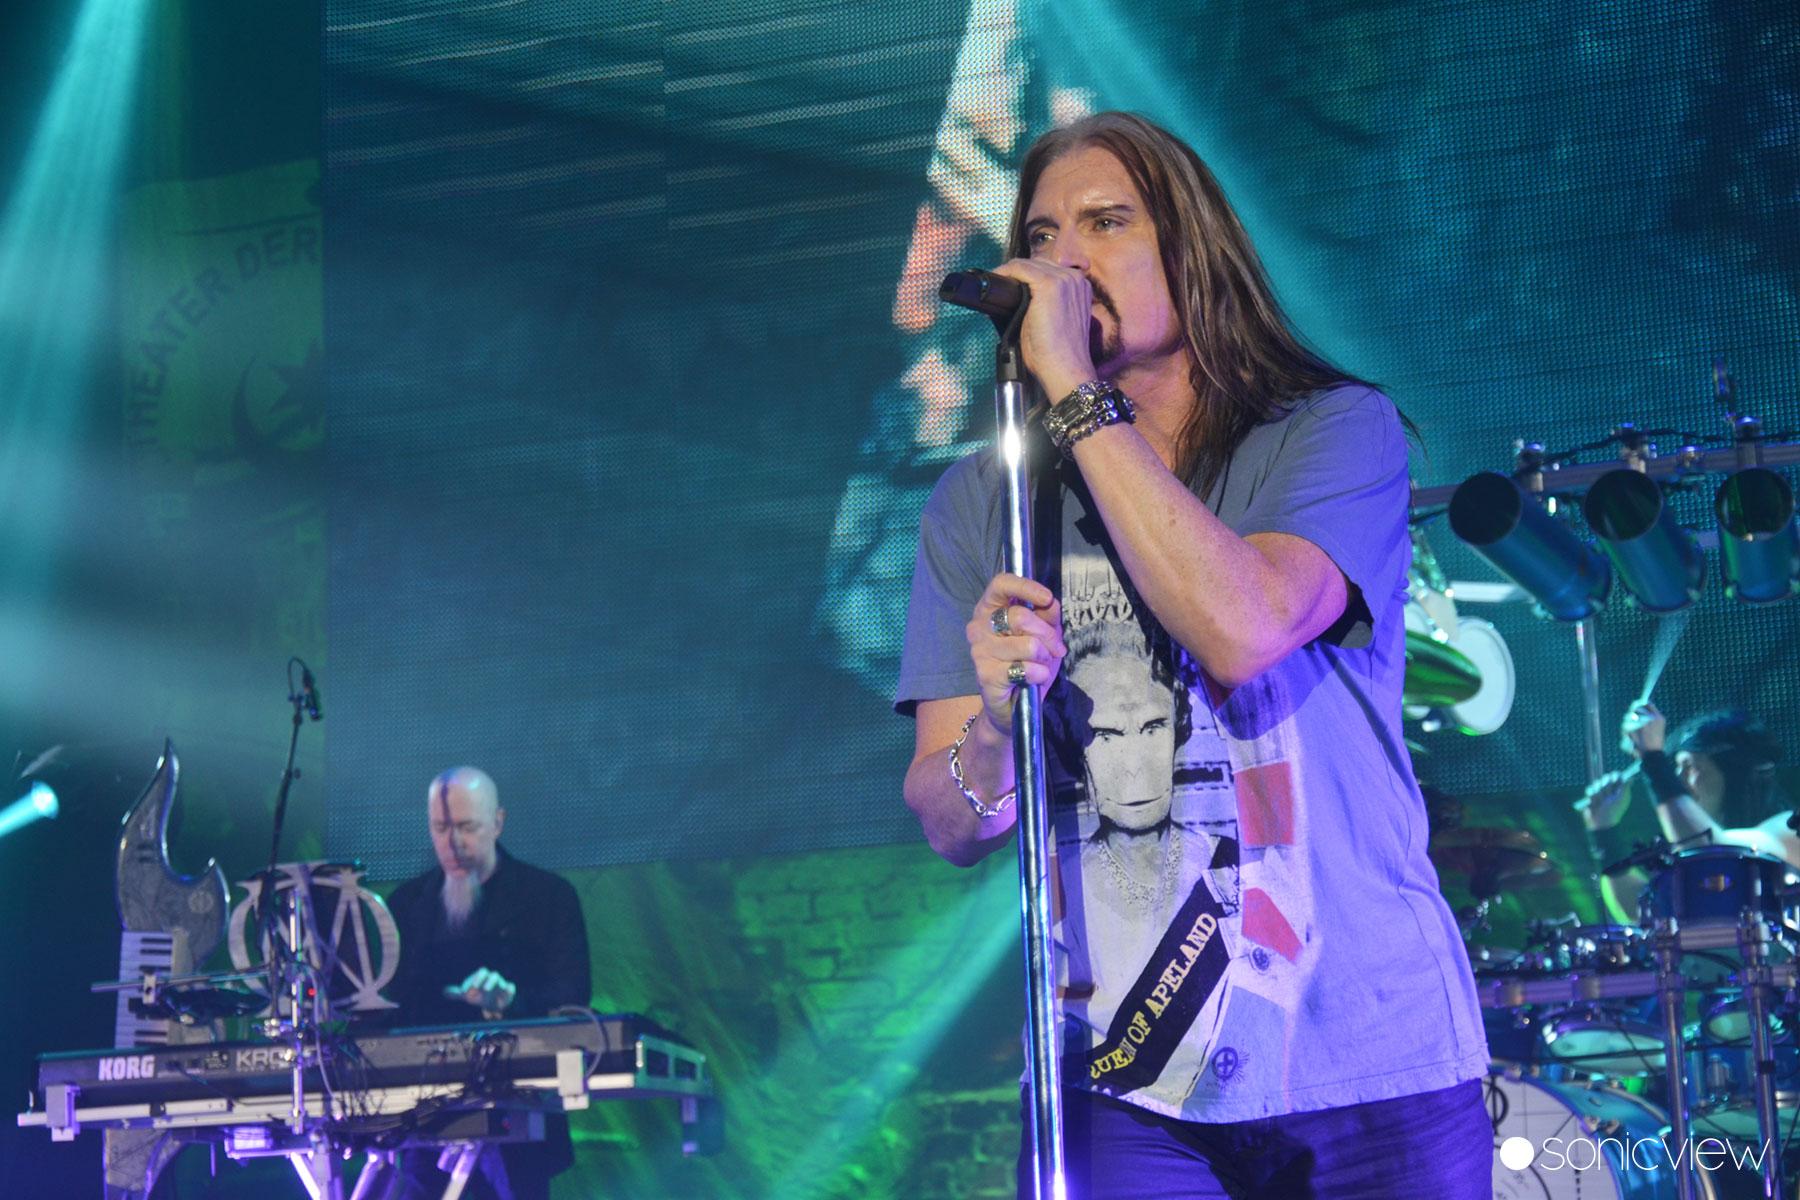 Dream Theater: Live at Falconer 2014, Copenhagen, Denmark